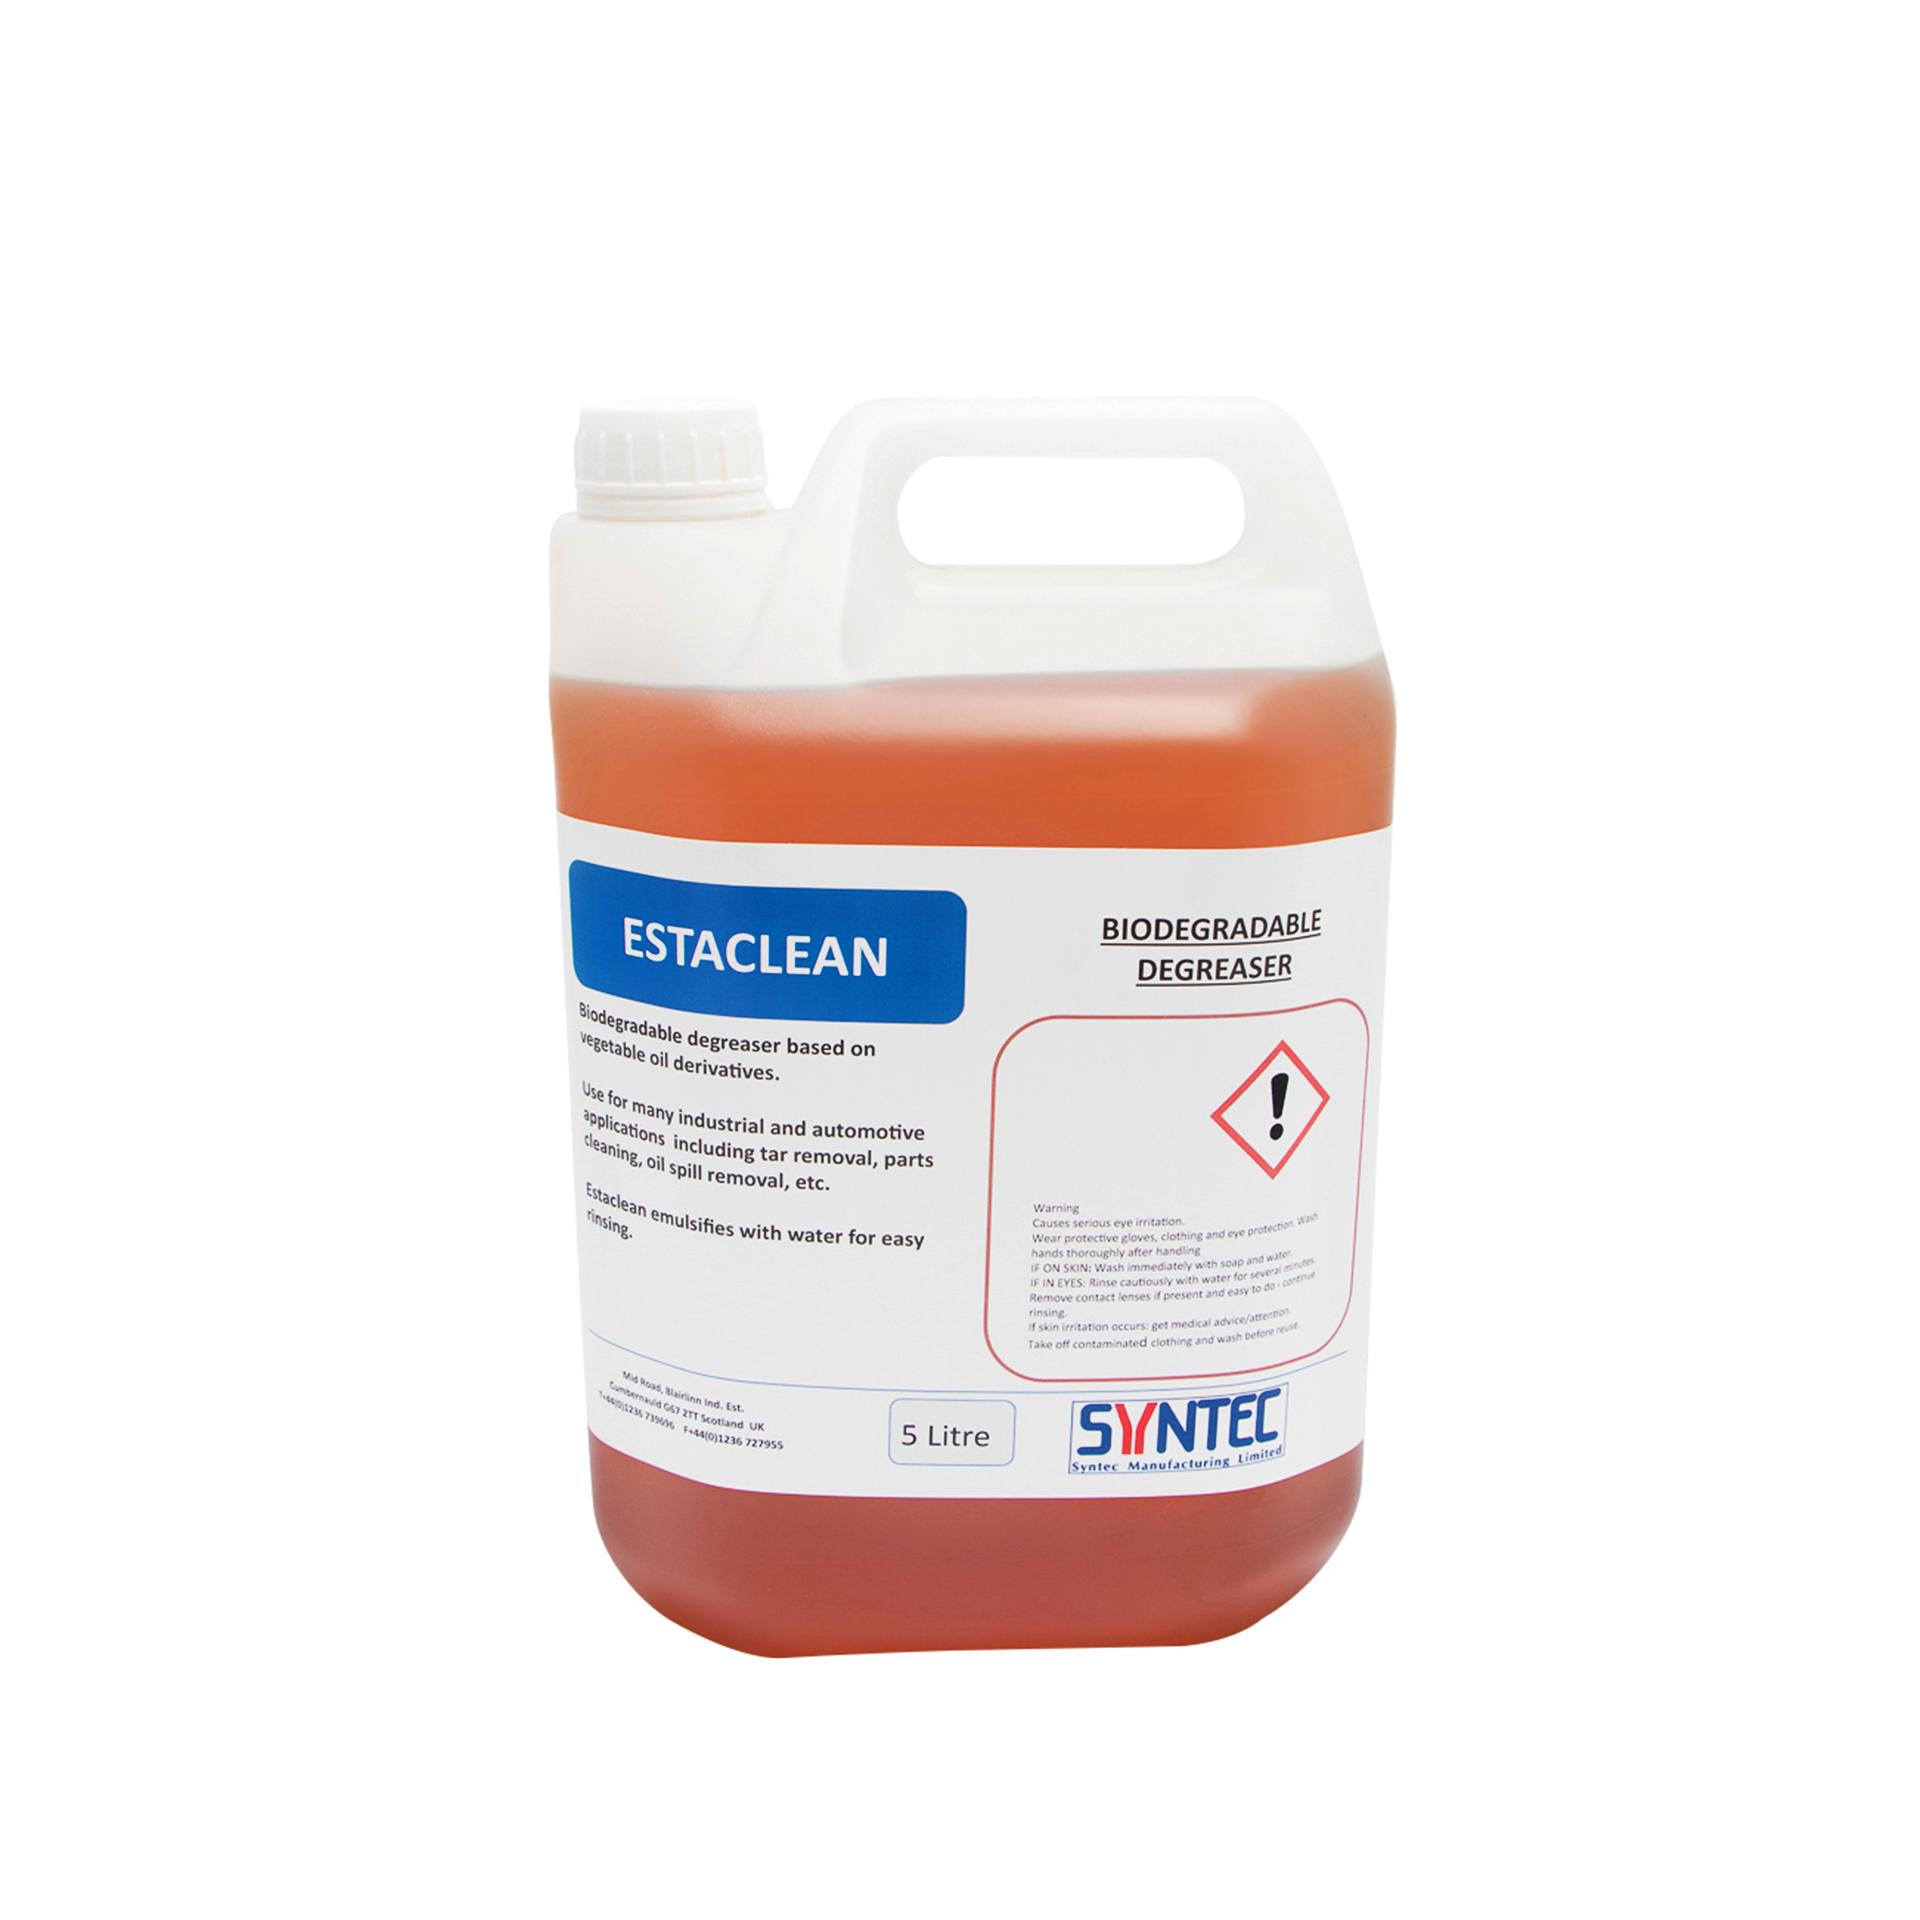 Heavy Duty Biodegradable Degreaser - Estaclean